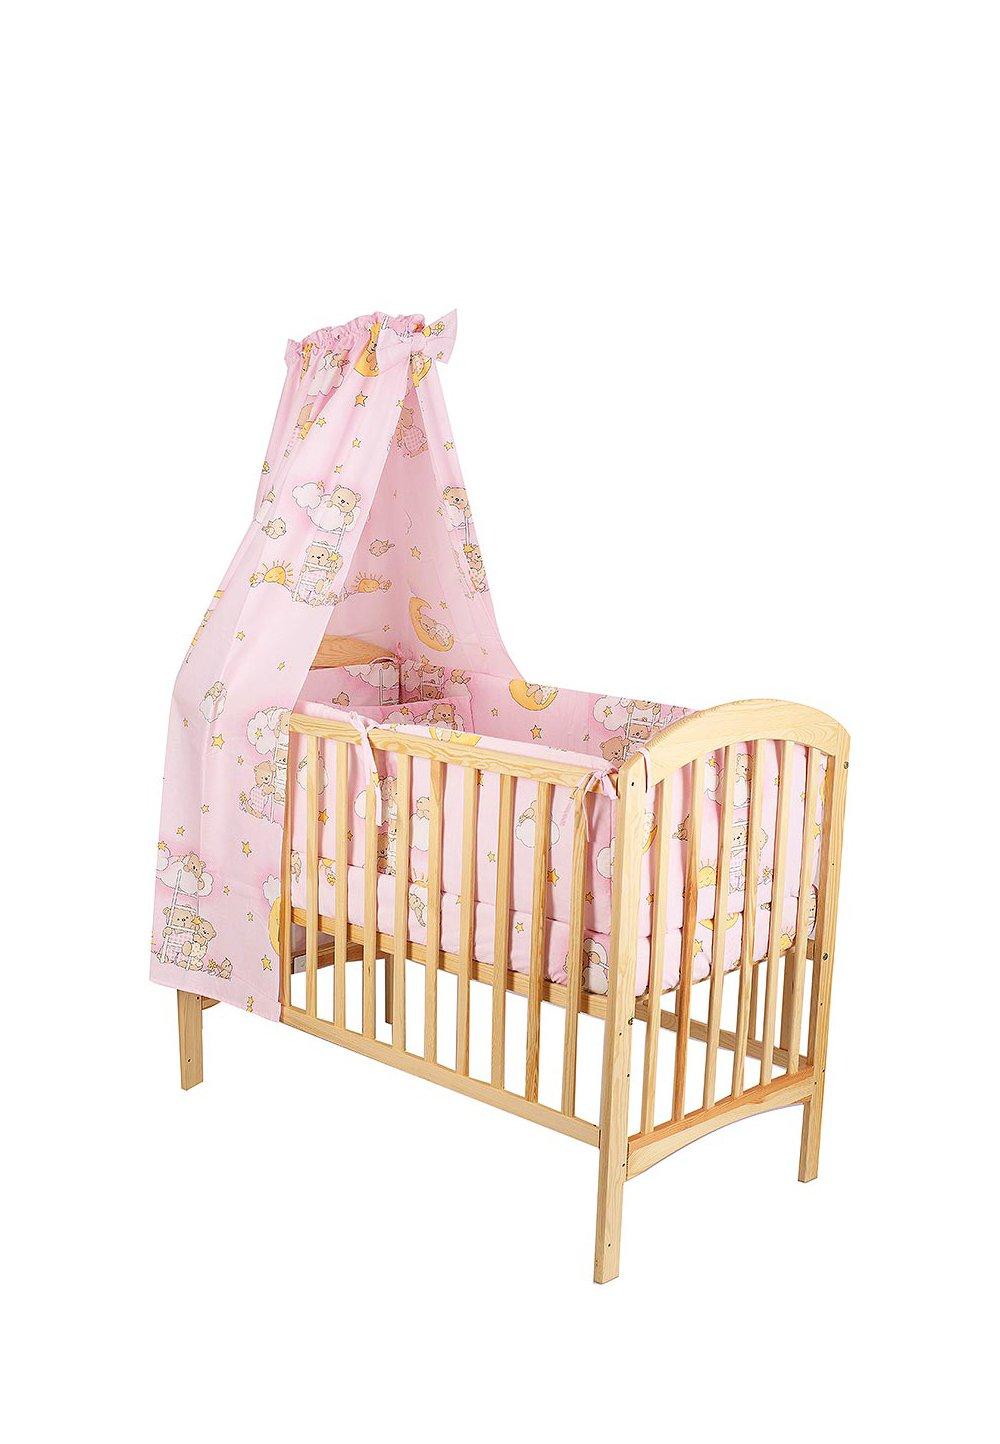 Lenjerie cu baldachin, 6 piese, ursuletul somnoros, roz 120x60 cm